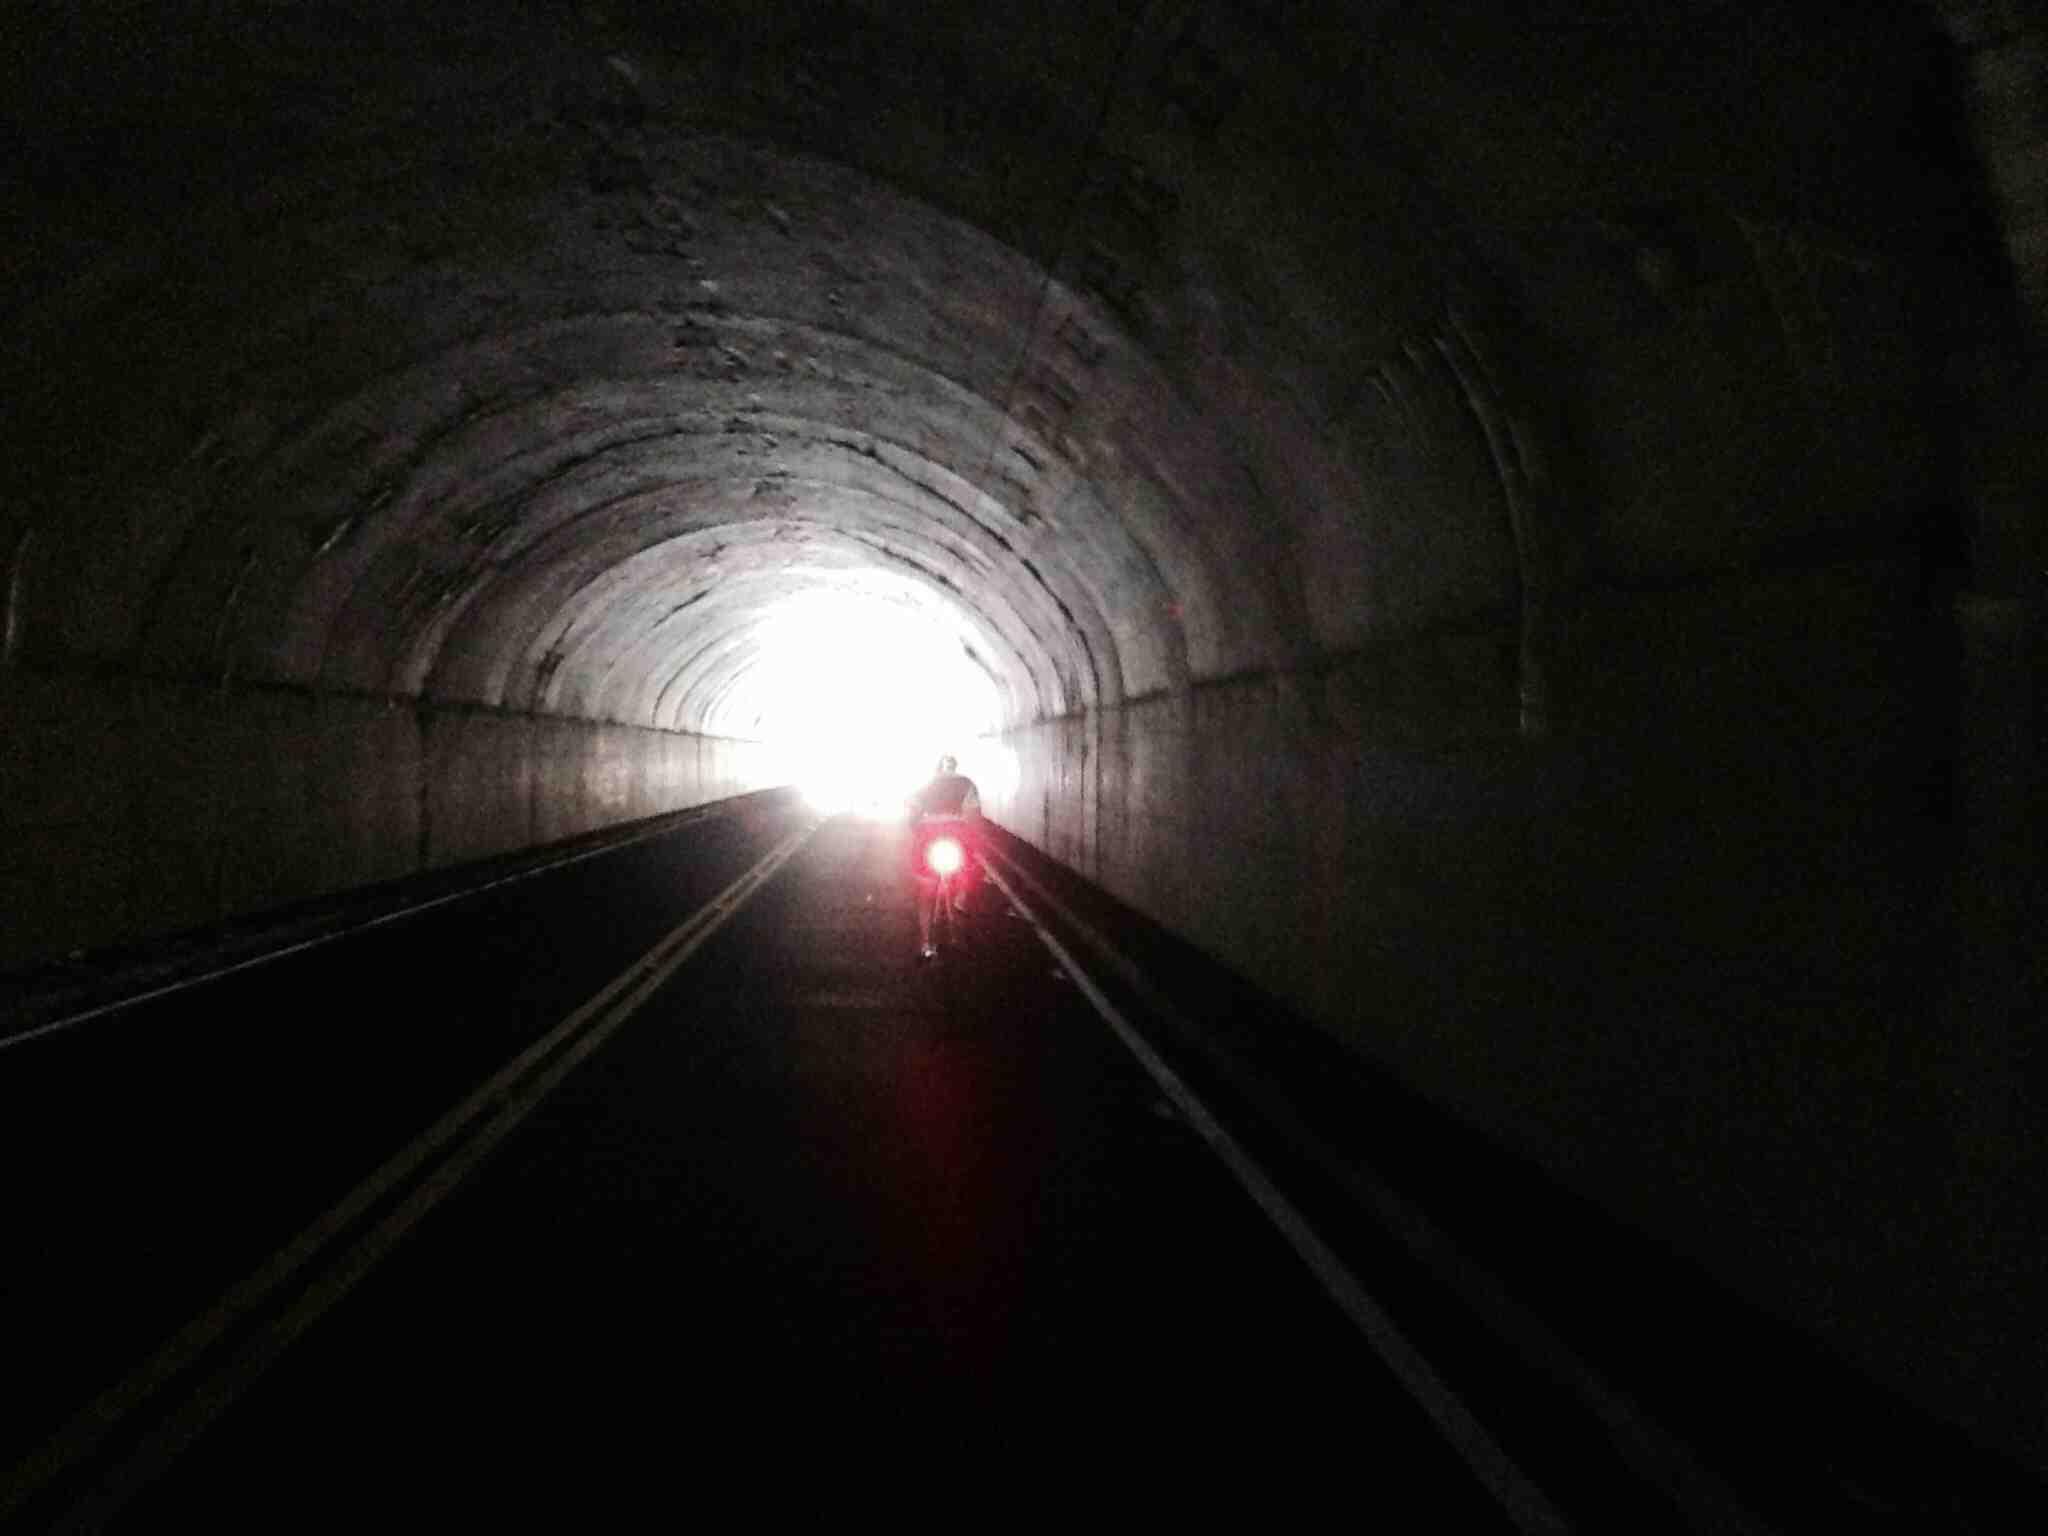 skyline tunnel